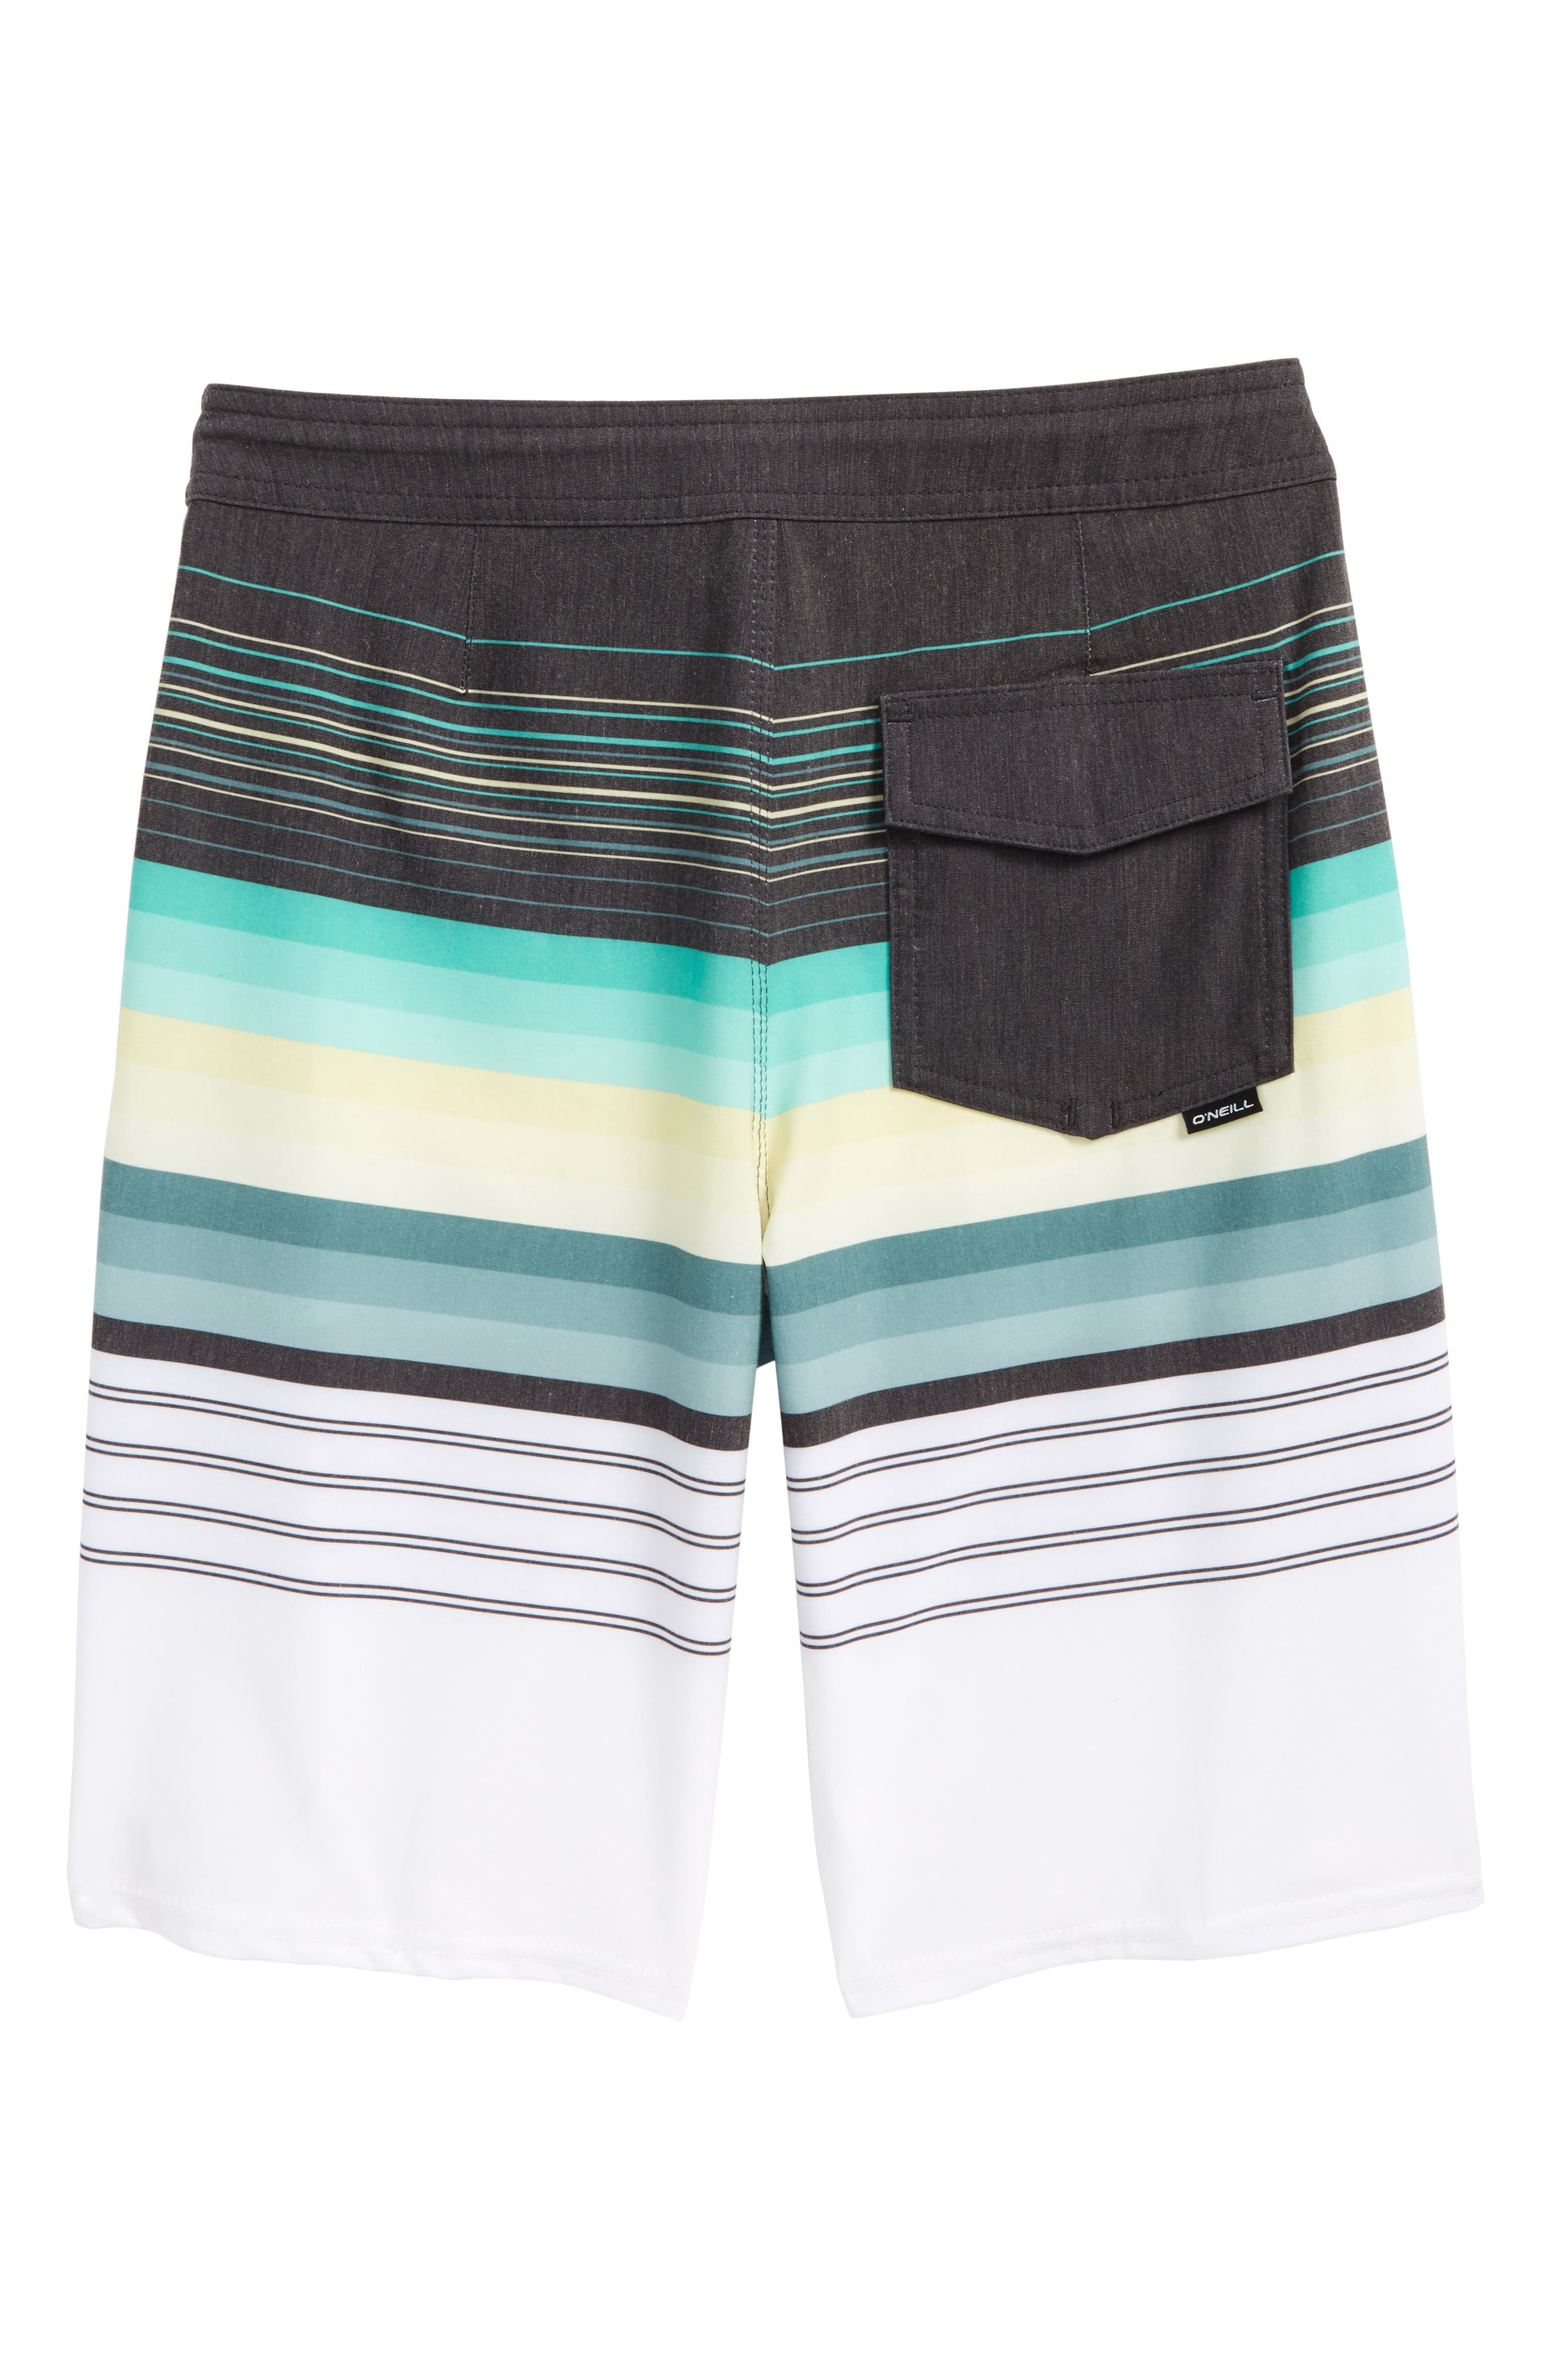 Sandbar Cruzer Board Shorts,                             Alternate thumbnail 2, color,                             001